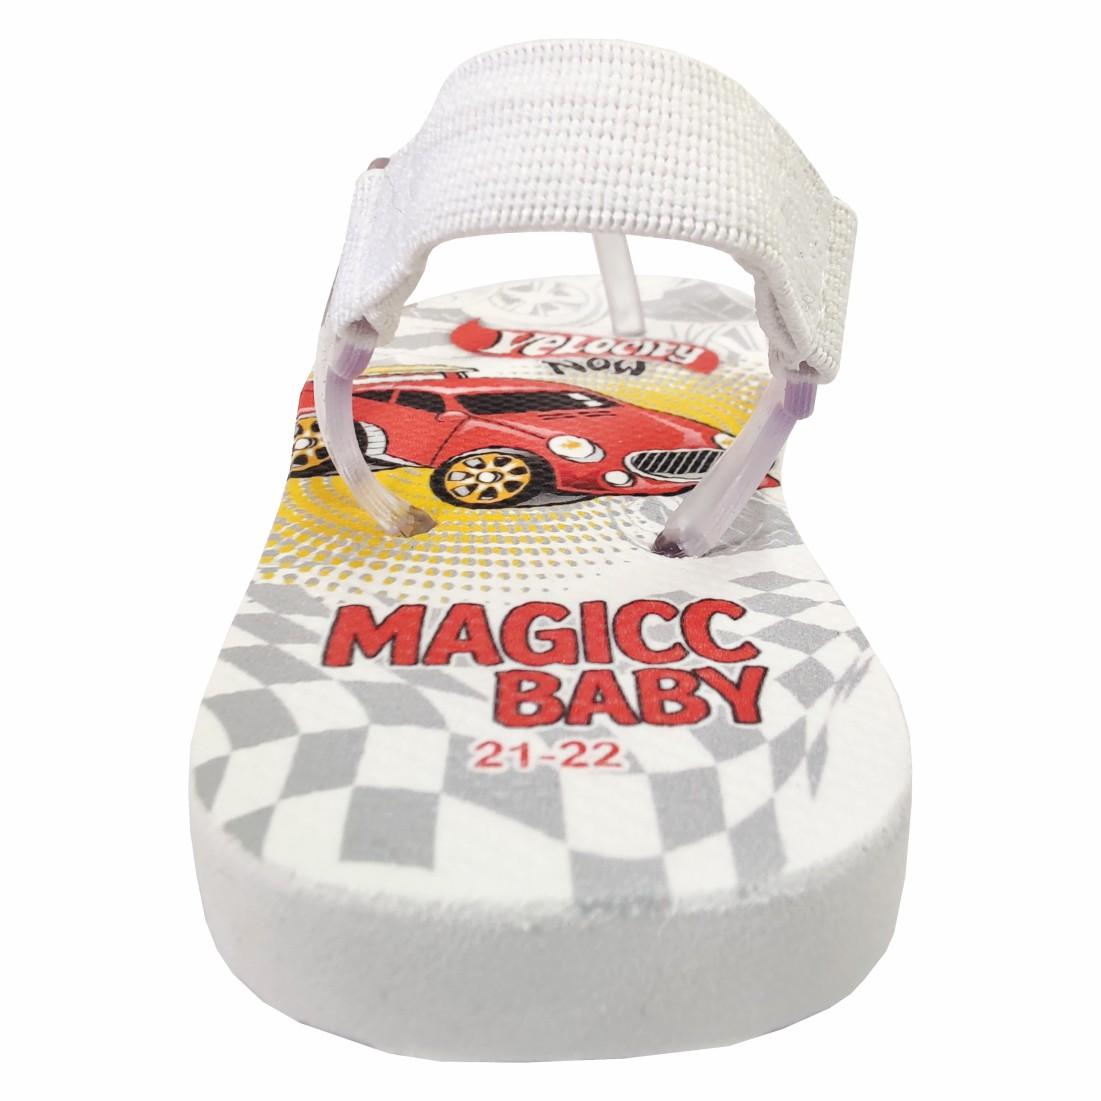 Chinelo Bebê Sandália Infantil Carrinho Meninos Magicc Baby